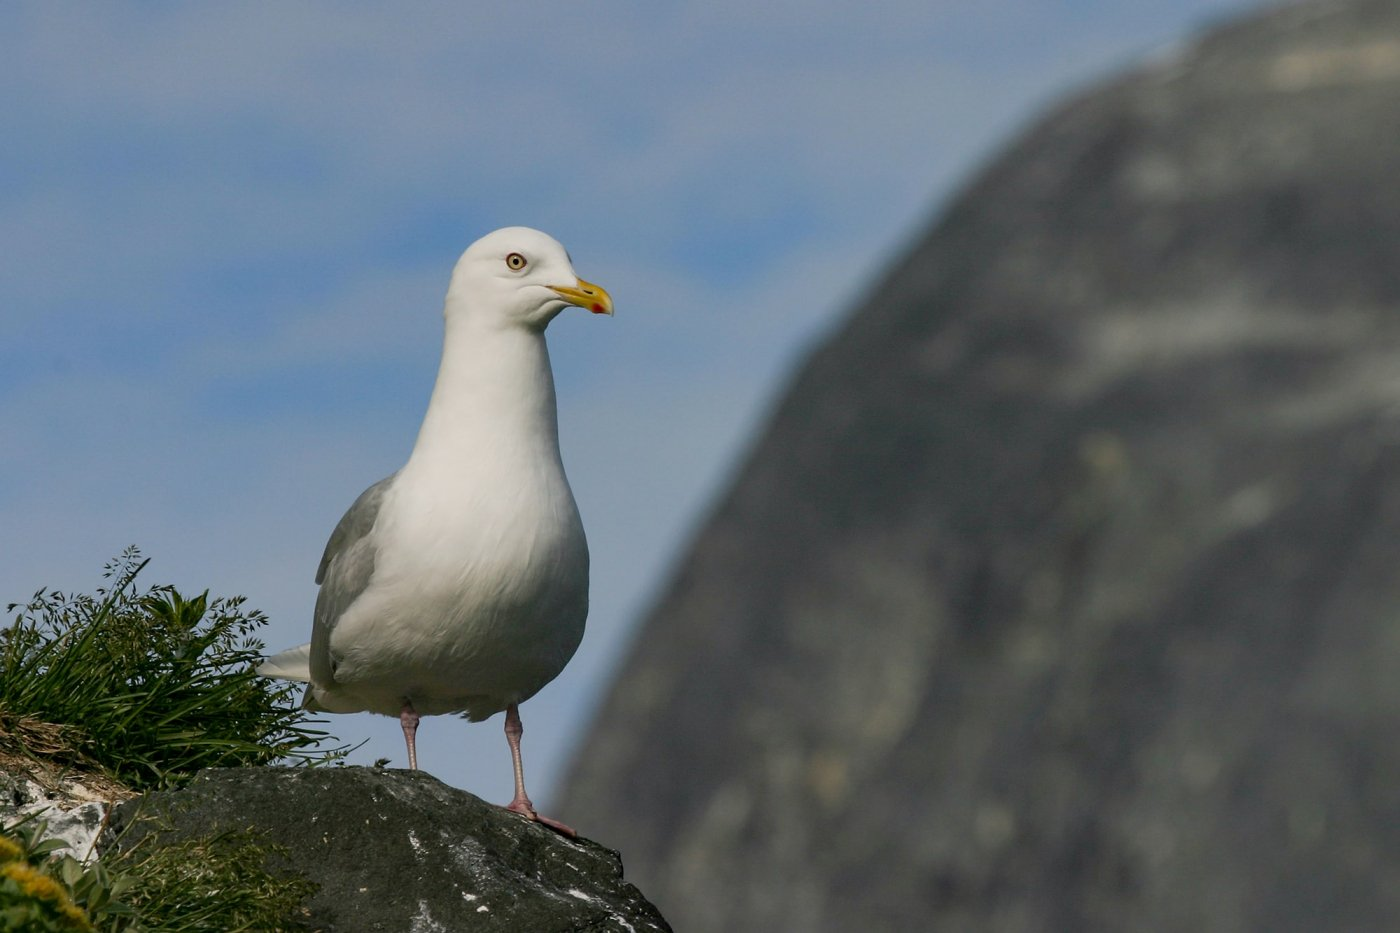 Iceland Gull -EN, Naajaannaq -KAL, Hvidvinget Måge -DA, Larus glaucoides -LAT. Photo by Carsten Egevang - Visit Greenland